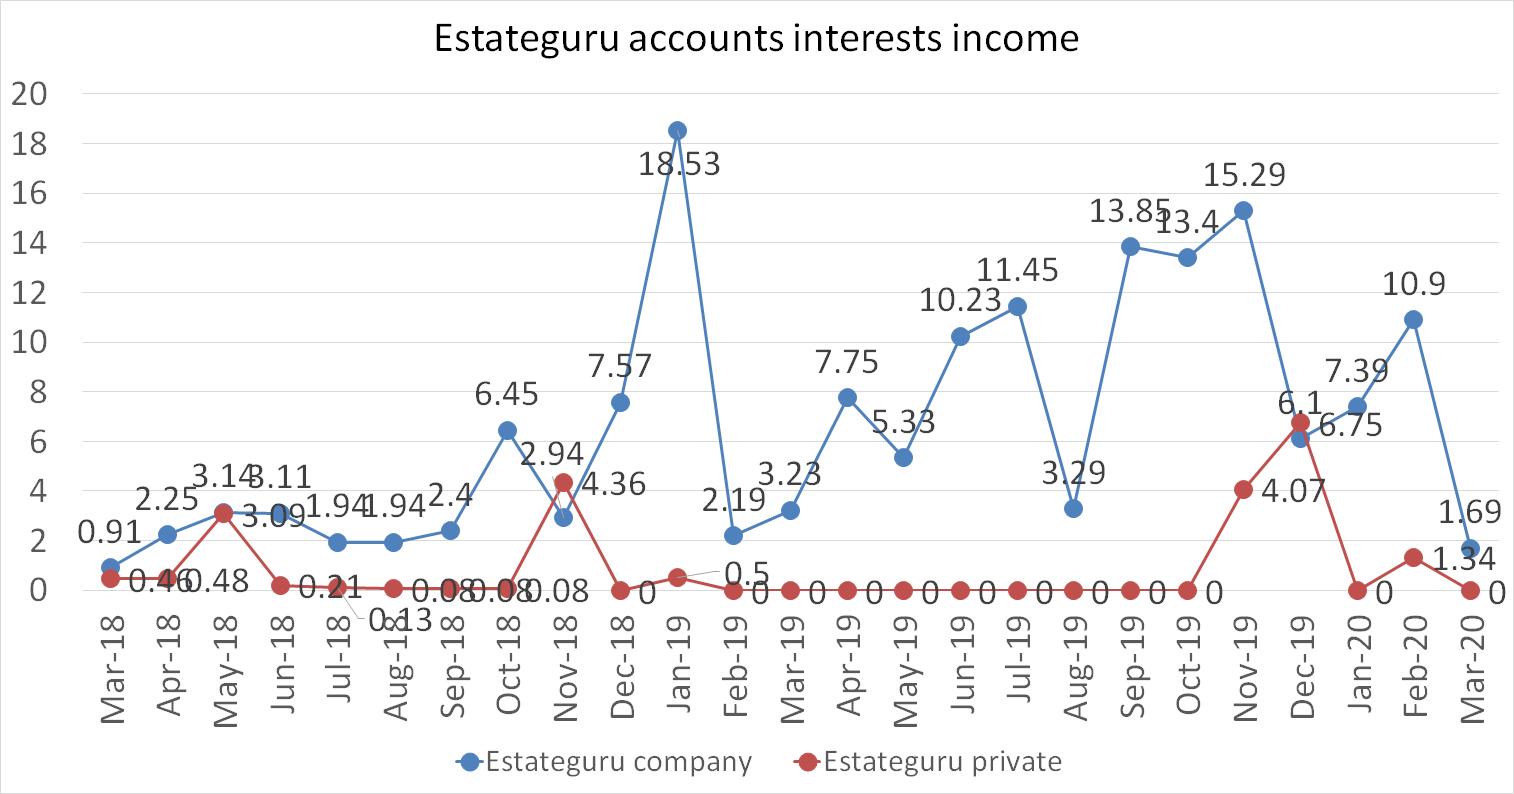 Estateguru accounts interests income in march 2020